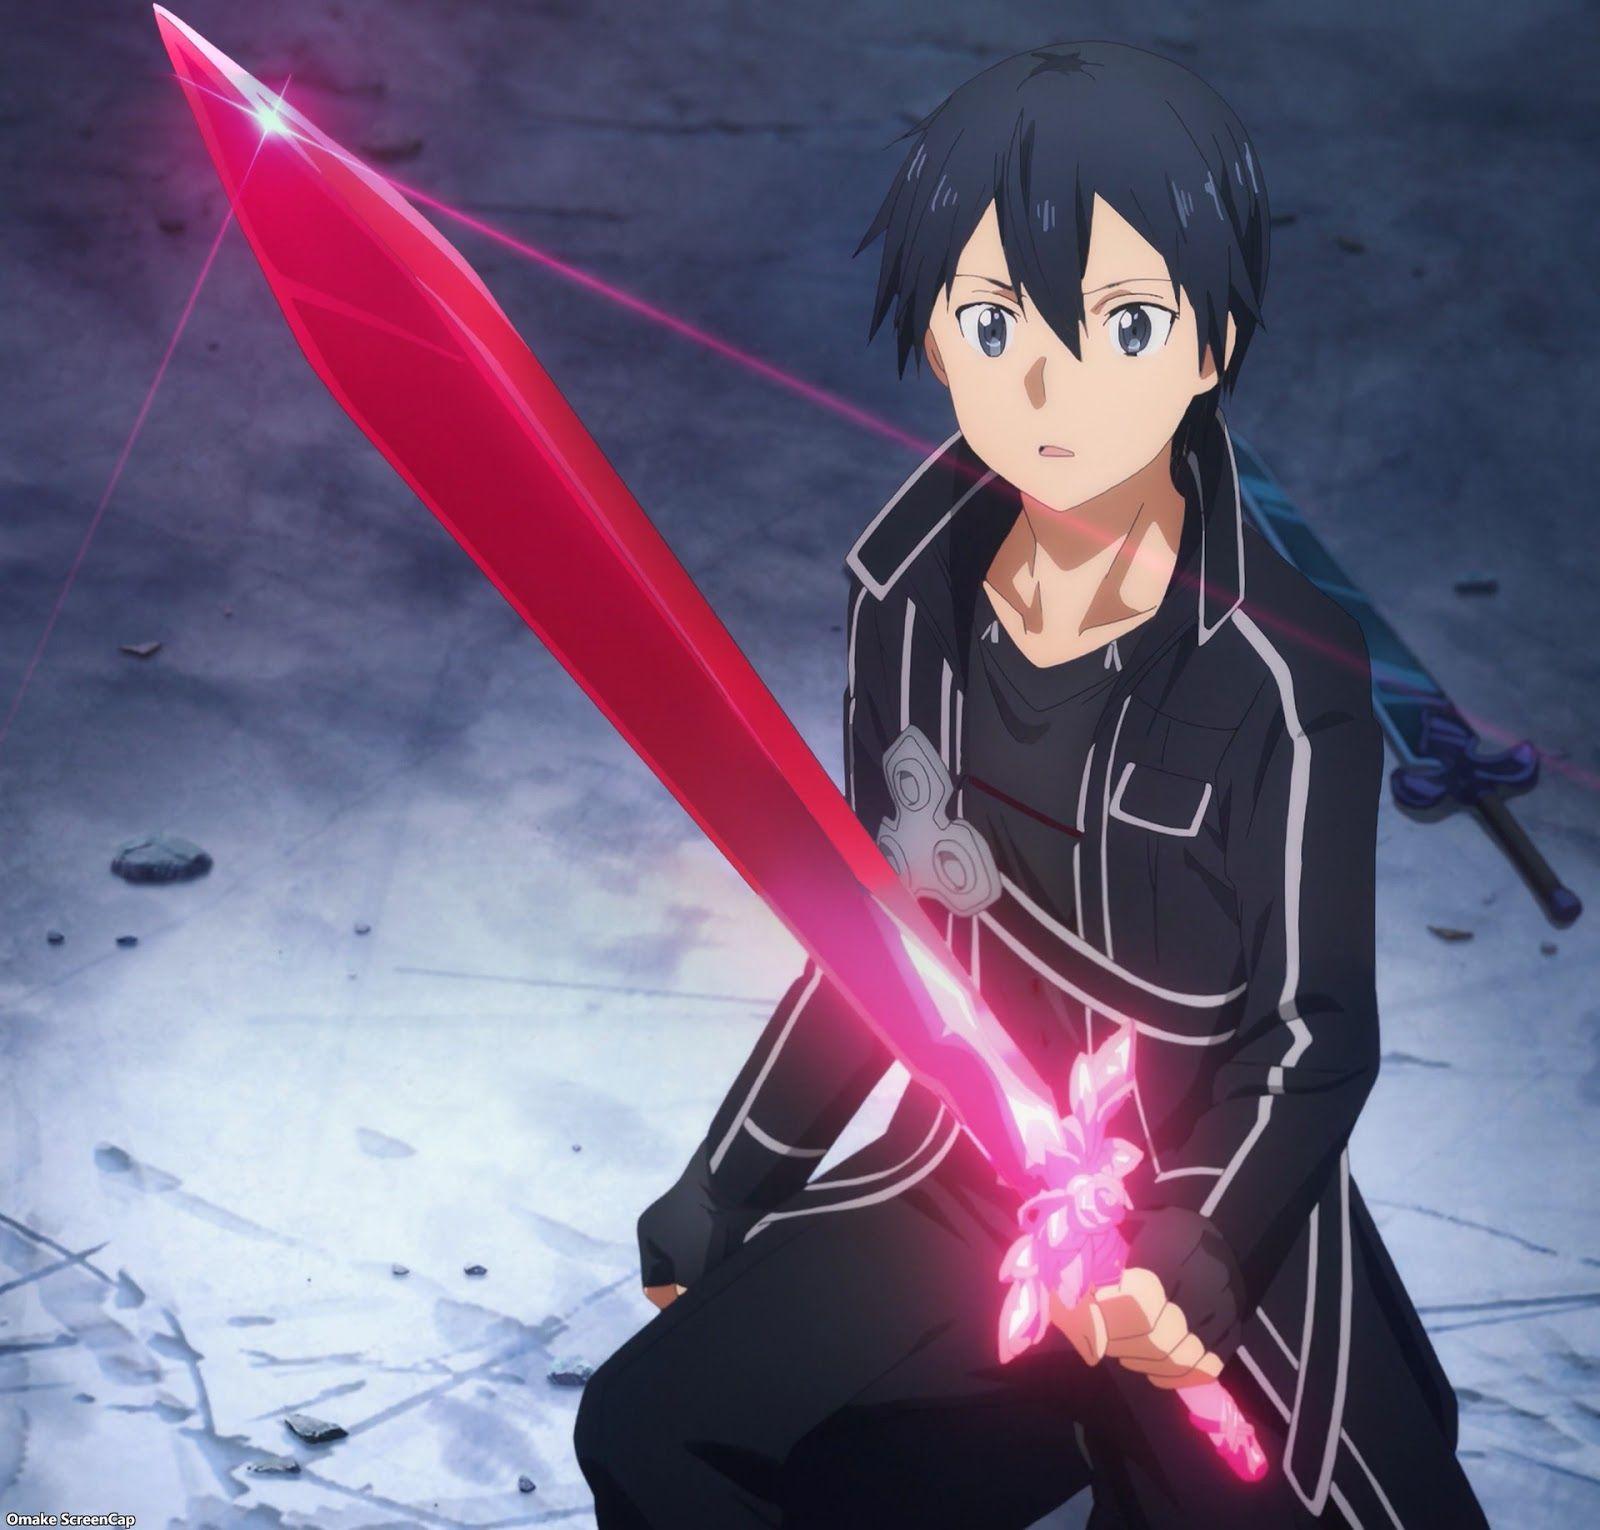 10 Second Anime Sword Art Online Alicization Episode